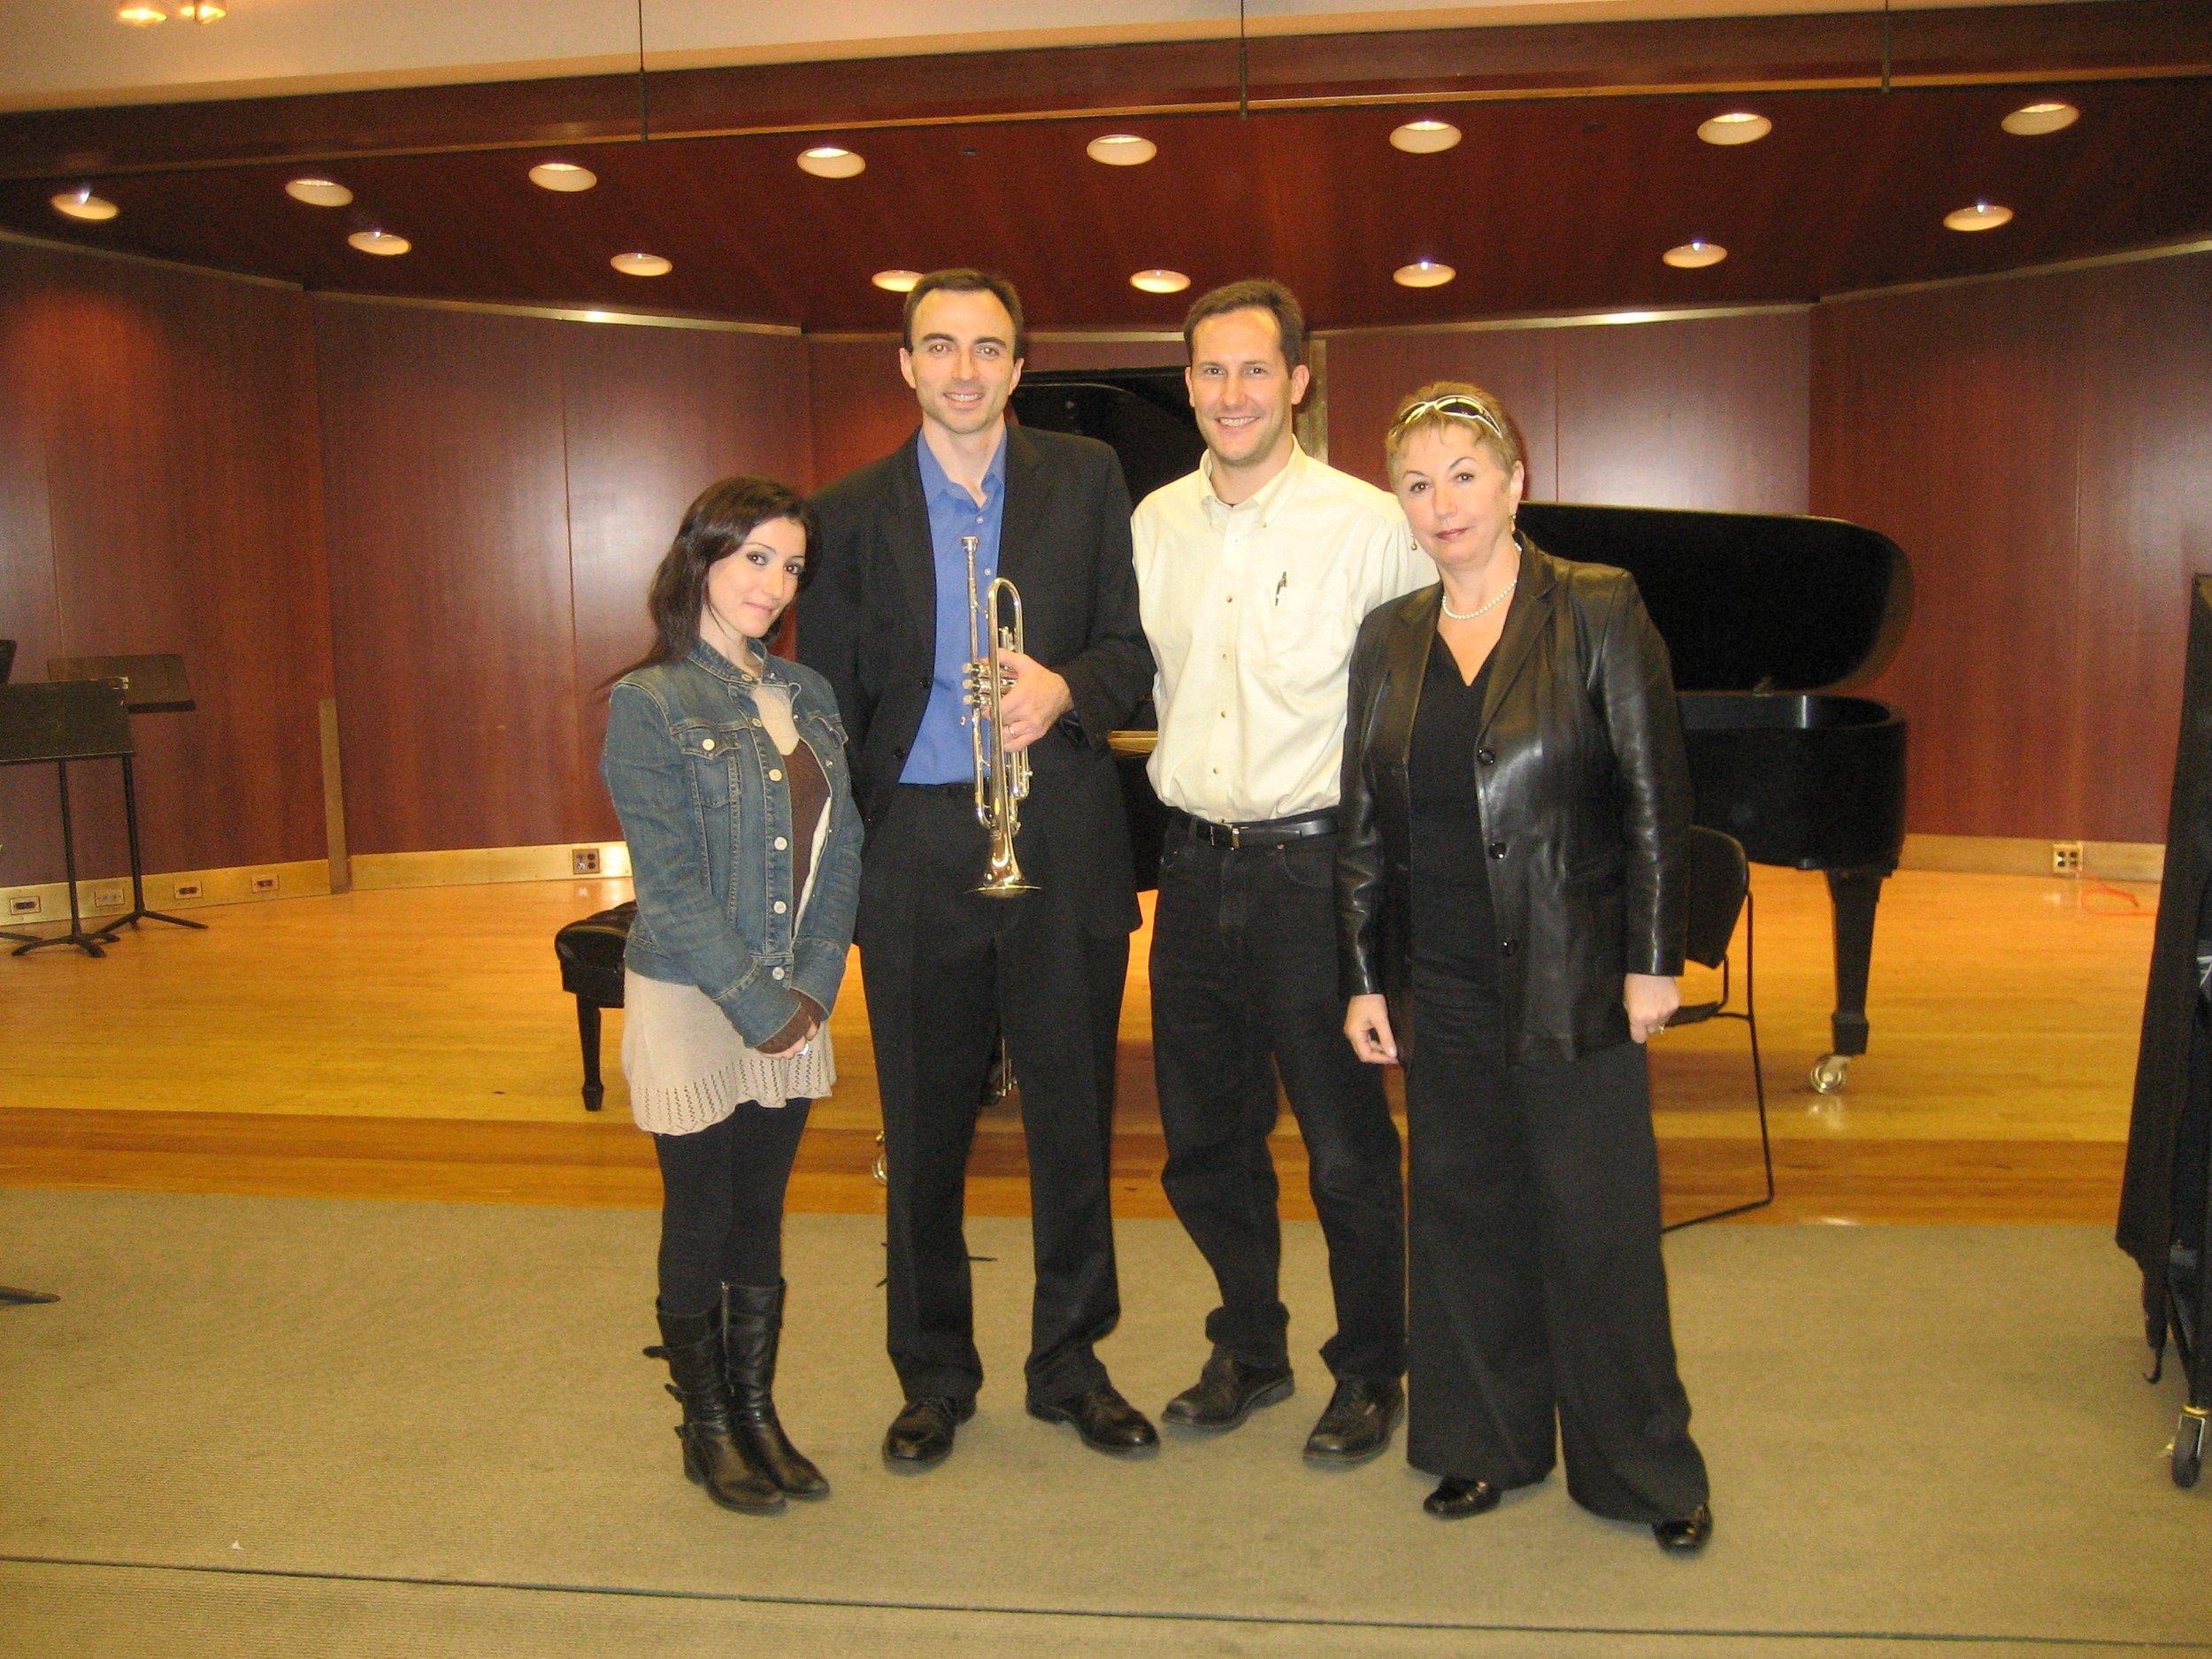 Masterclass at Juilliard School, Anna Dokshizer, Kevin Cobb and Irene Dokshizer